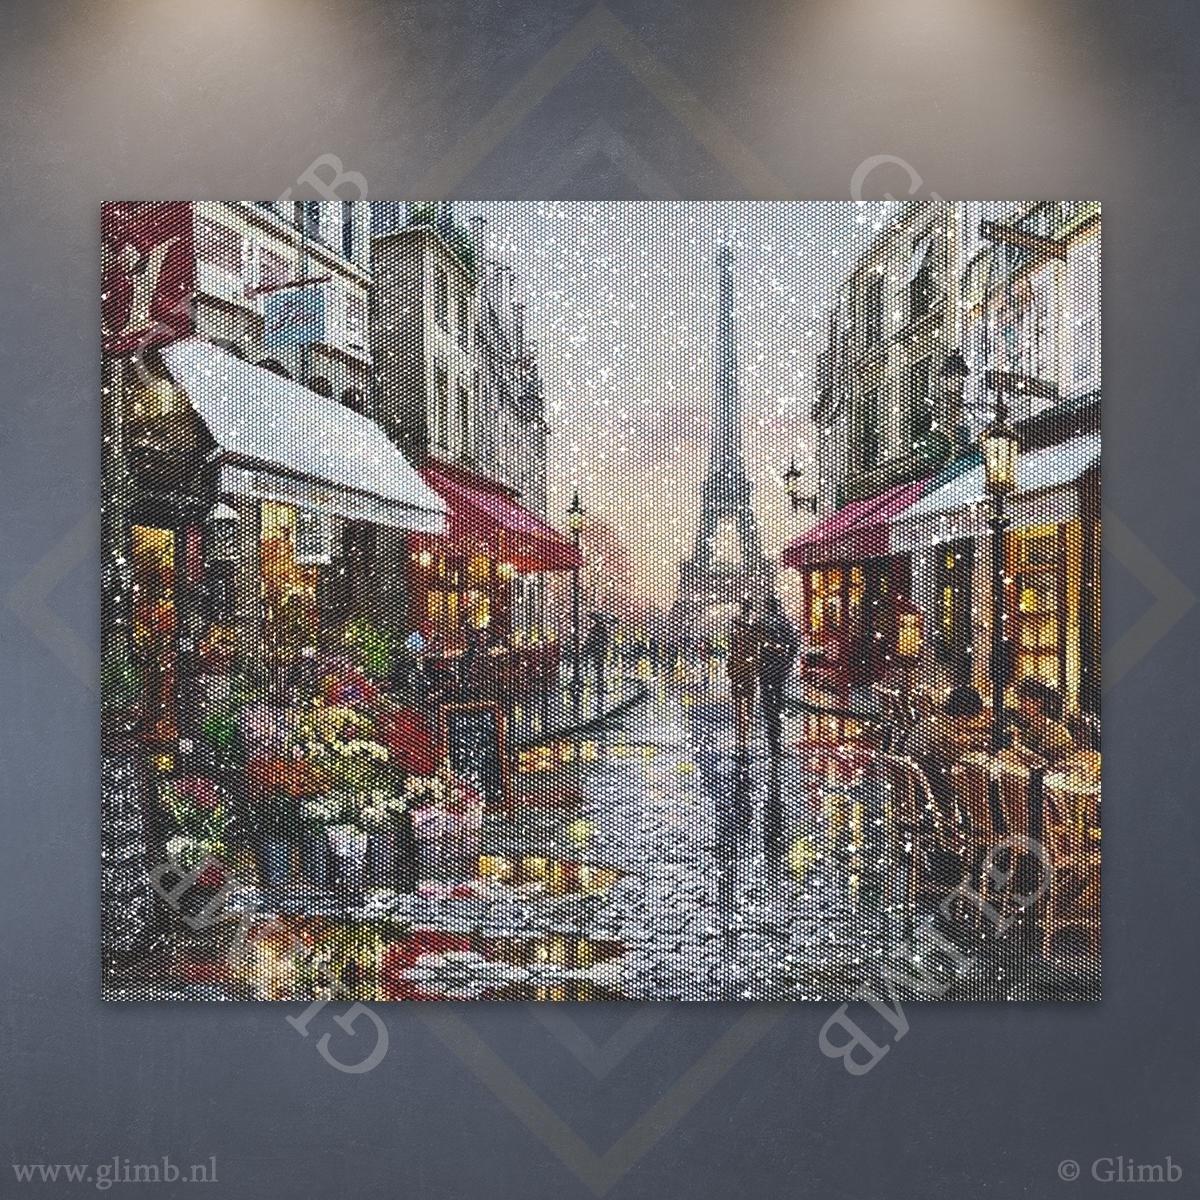 Glimb®   HQ Diamond Painting Pakket   Parijs   50x40cm   Vierkant   Volledig   Made in NL! // Diamond Painting - Diamond Painting Pakketten - Diamond Paint - Daimond Painting - Dotz -Diamond Schilderen - Diamond Painting Volwassenen